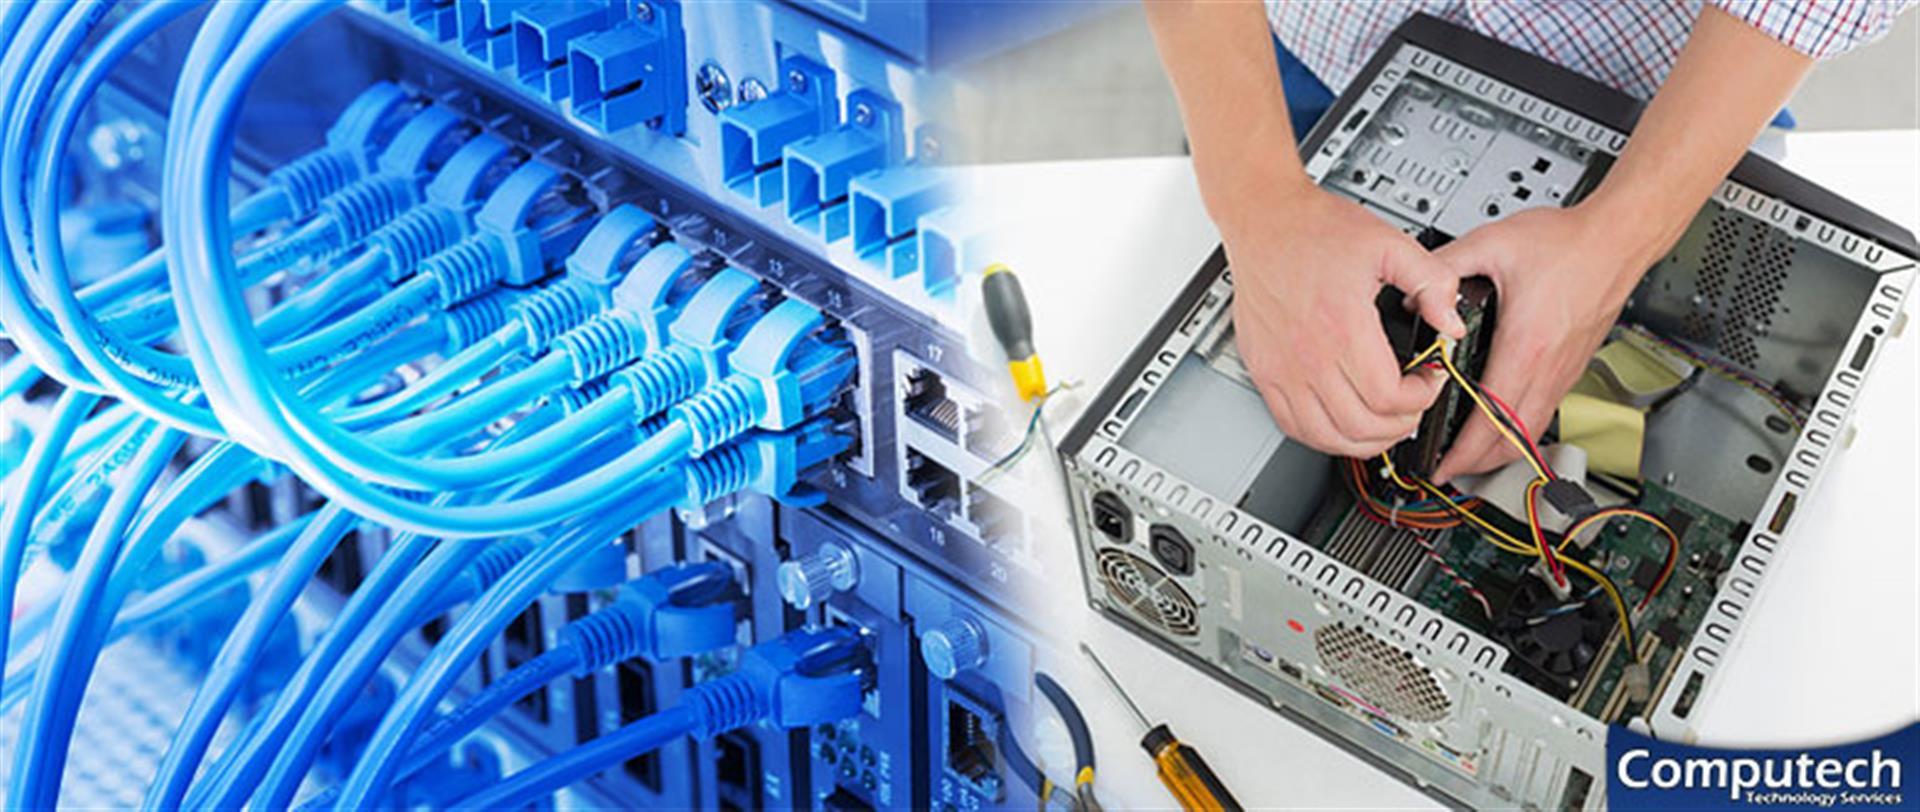 Tallassee Alabama Onsite Computer PC & Printer Repairs, Network, Telecom & Data Inside Wiring Services